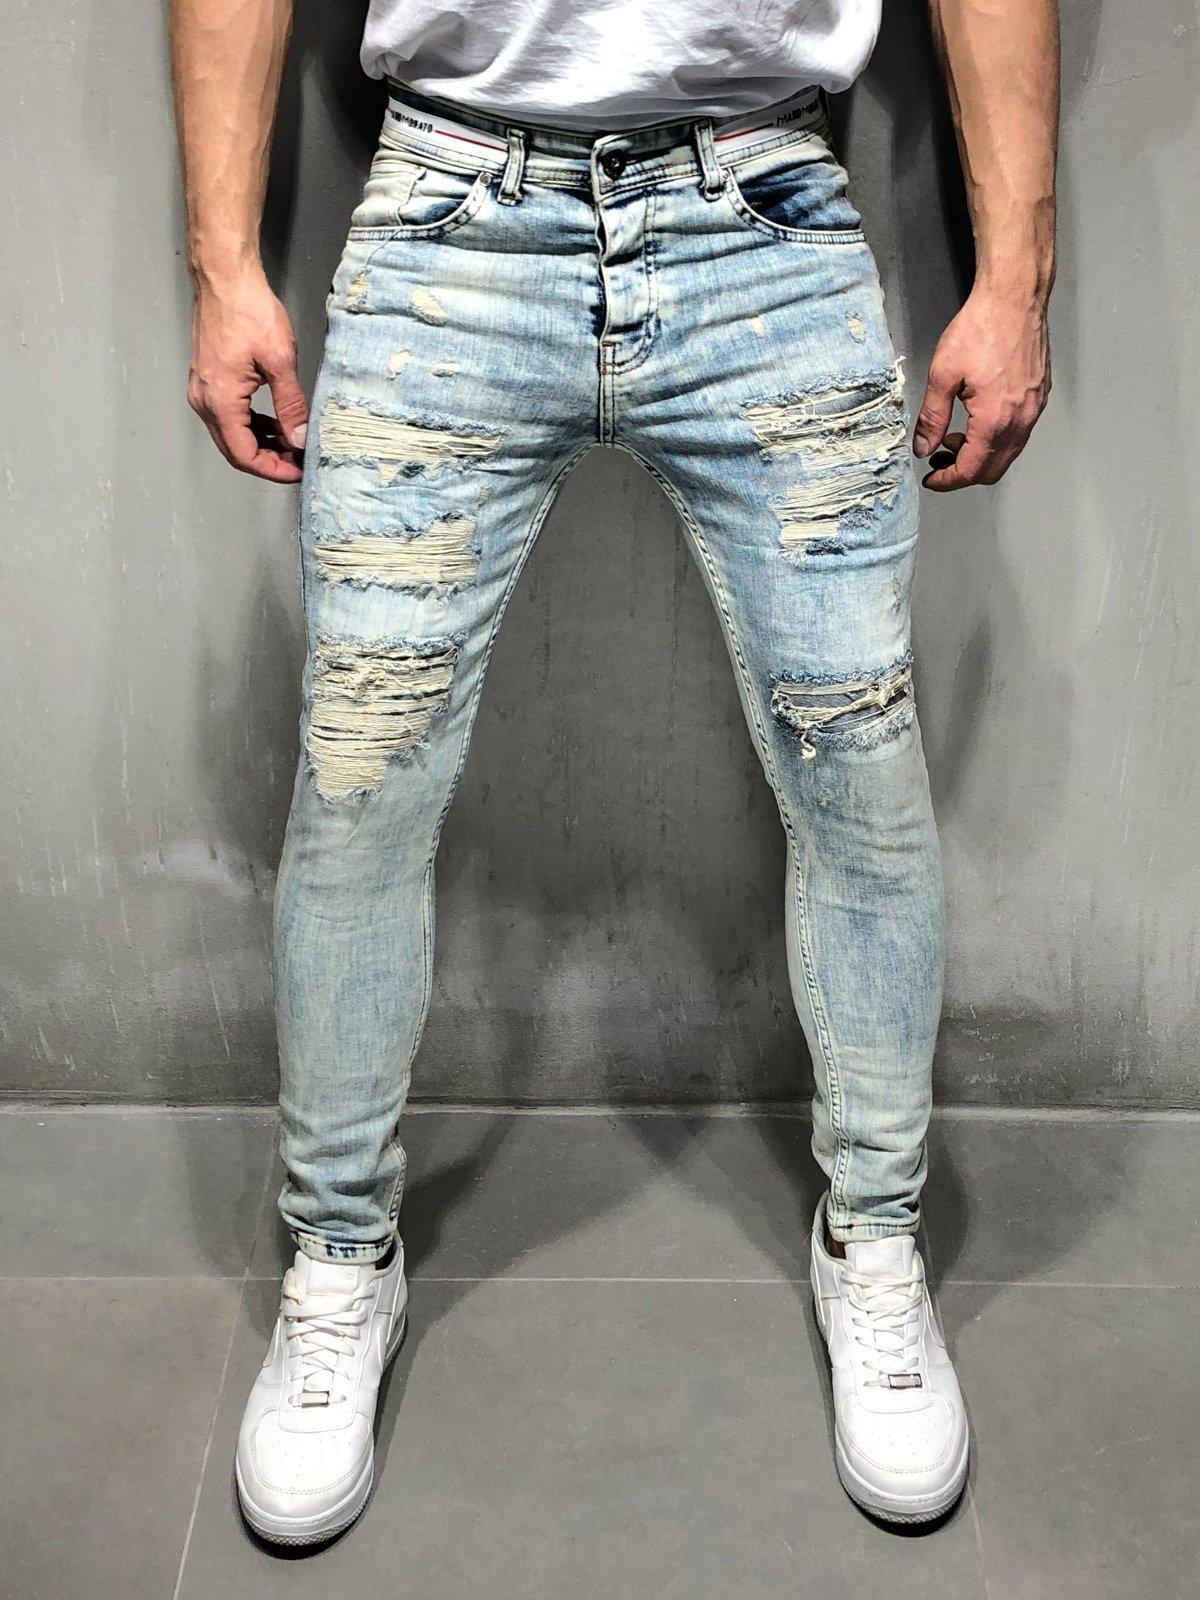 03680989 Bleach Wash Jeans Random Rips . #mensfashion #mensweardaily #mensstyle